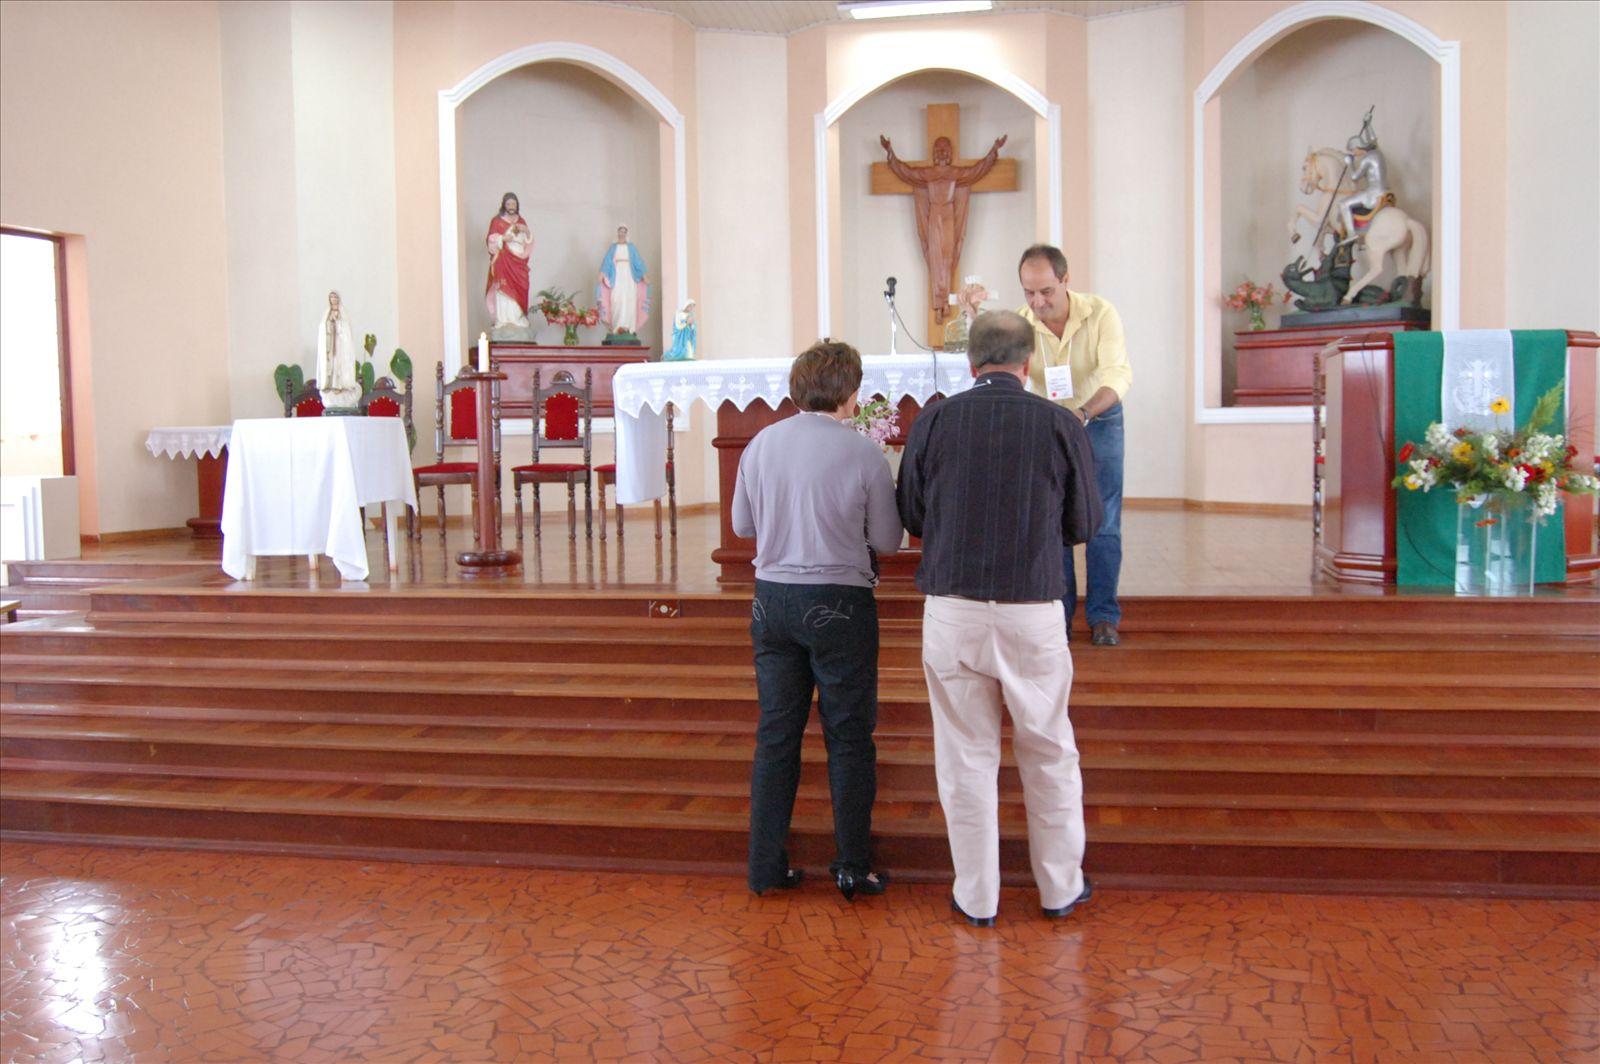 2º Encontro Família Cornelli - 11.10.2009 (103)_0